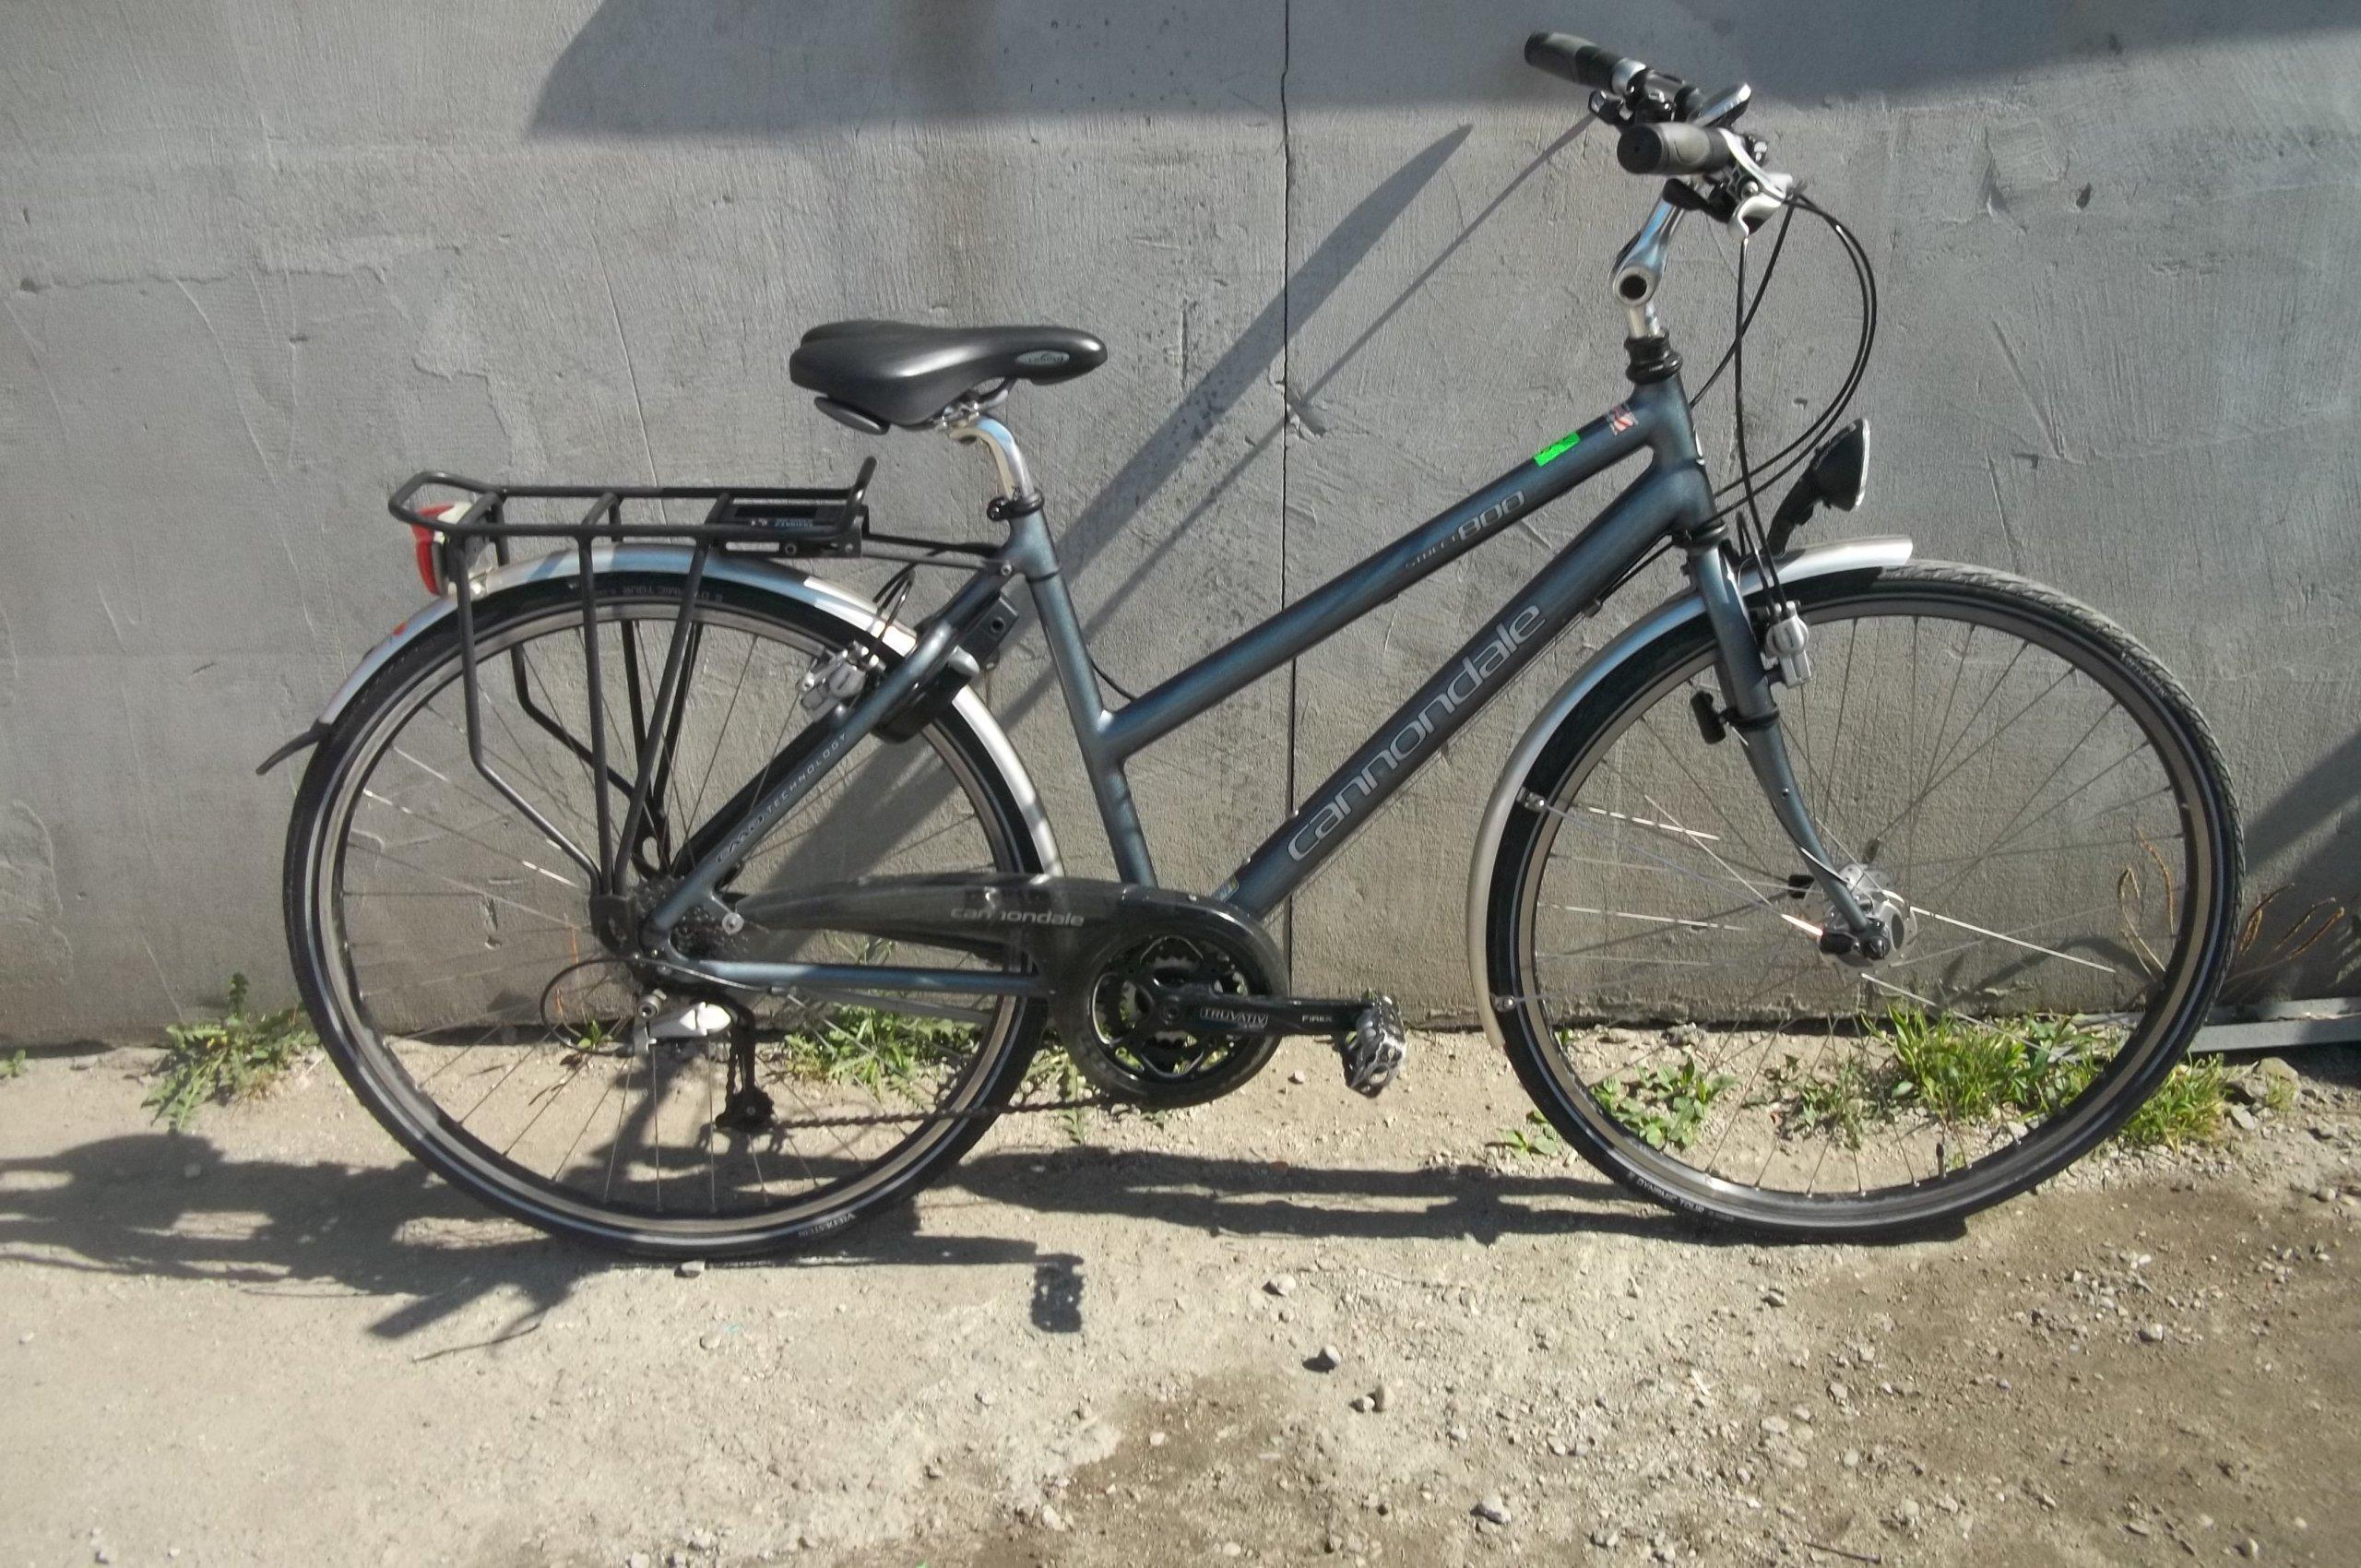 Porządny rower cannondale trekking deore lx